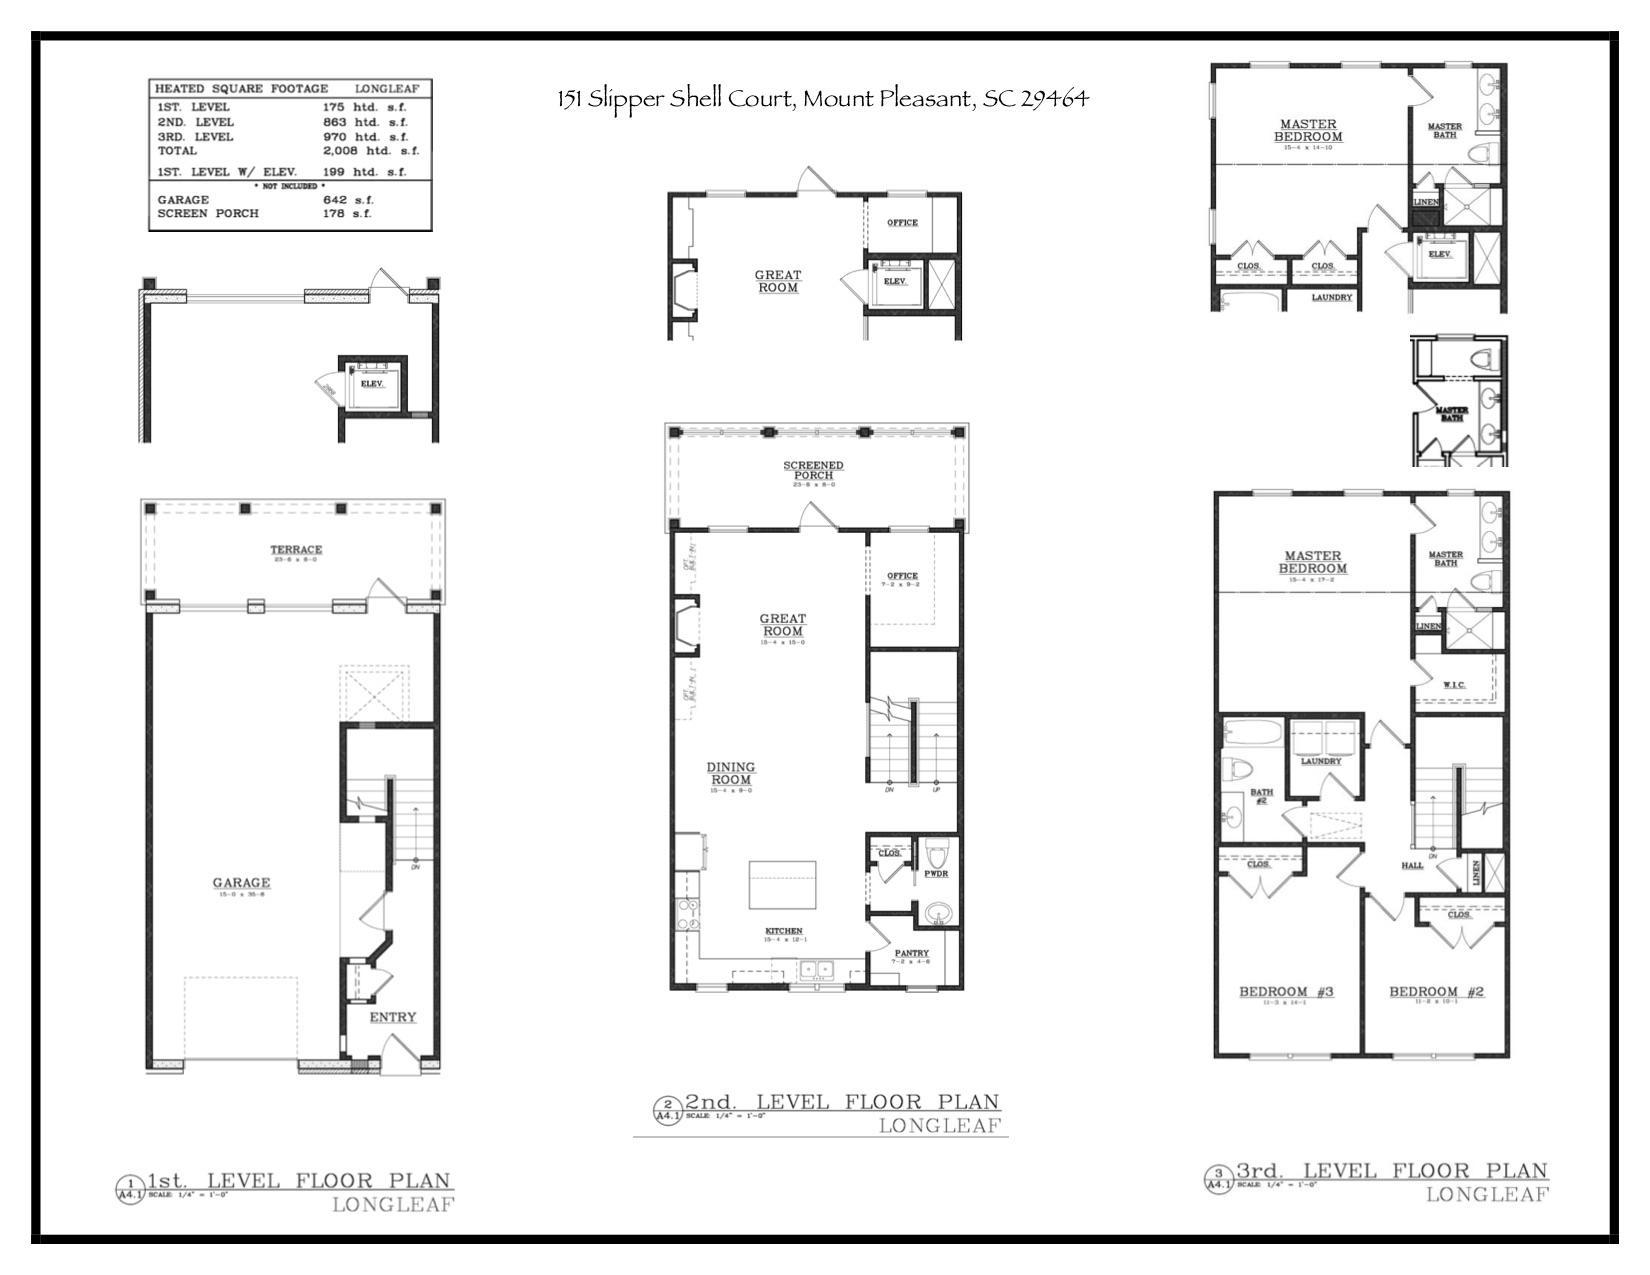 Etiwan Pointe Homes For Sale - 151 Slipper Shell, Mount Pleasant, SC - 13